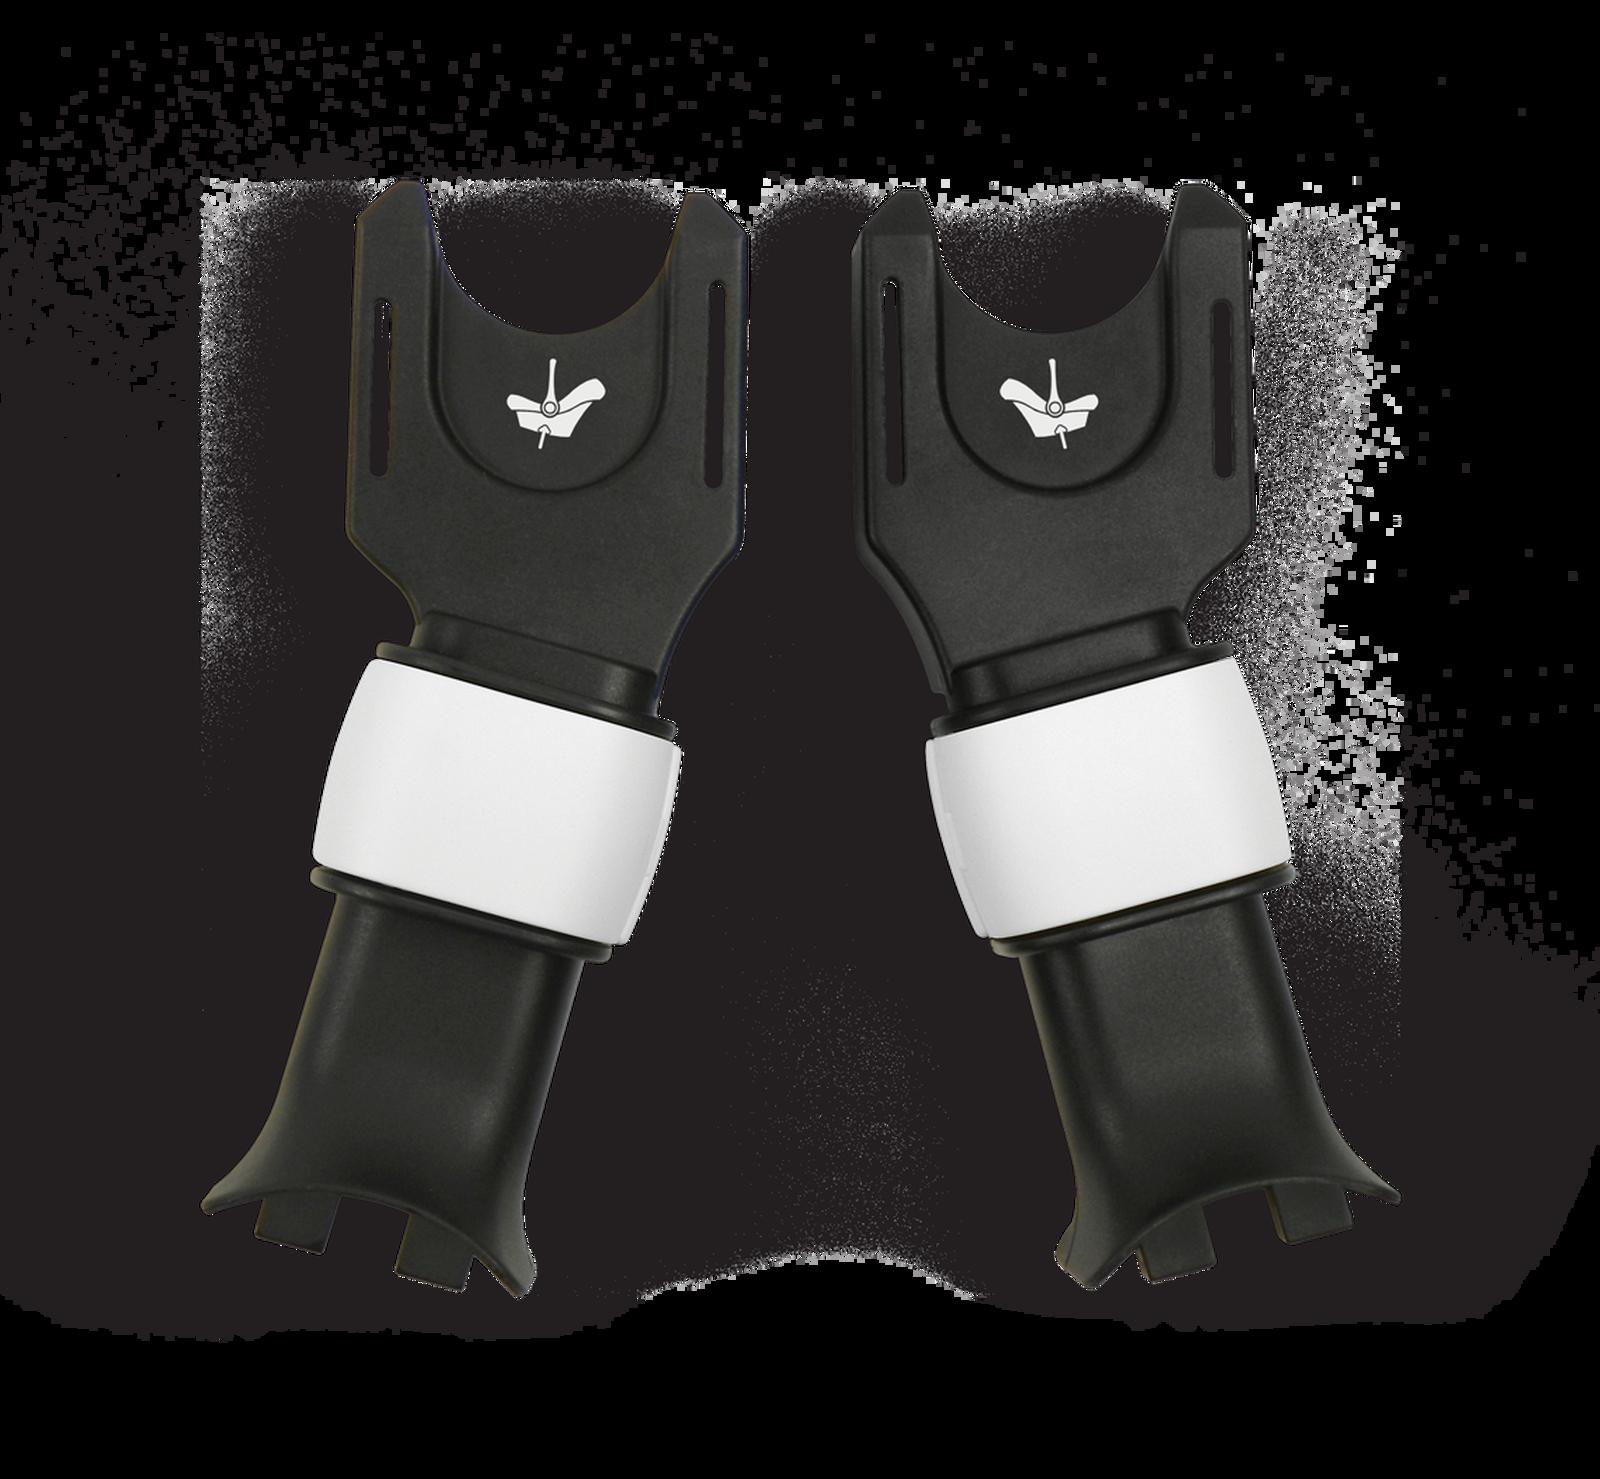 Bugaboo Cameleon 3 Plus Adapter for Maxi Cosi® Car Seats Black